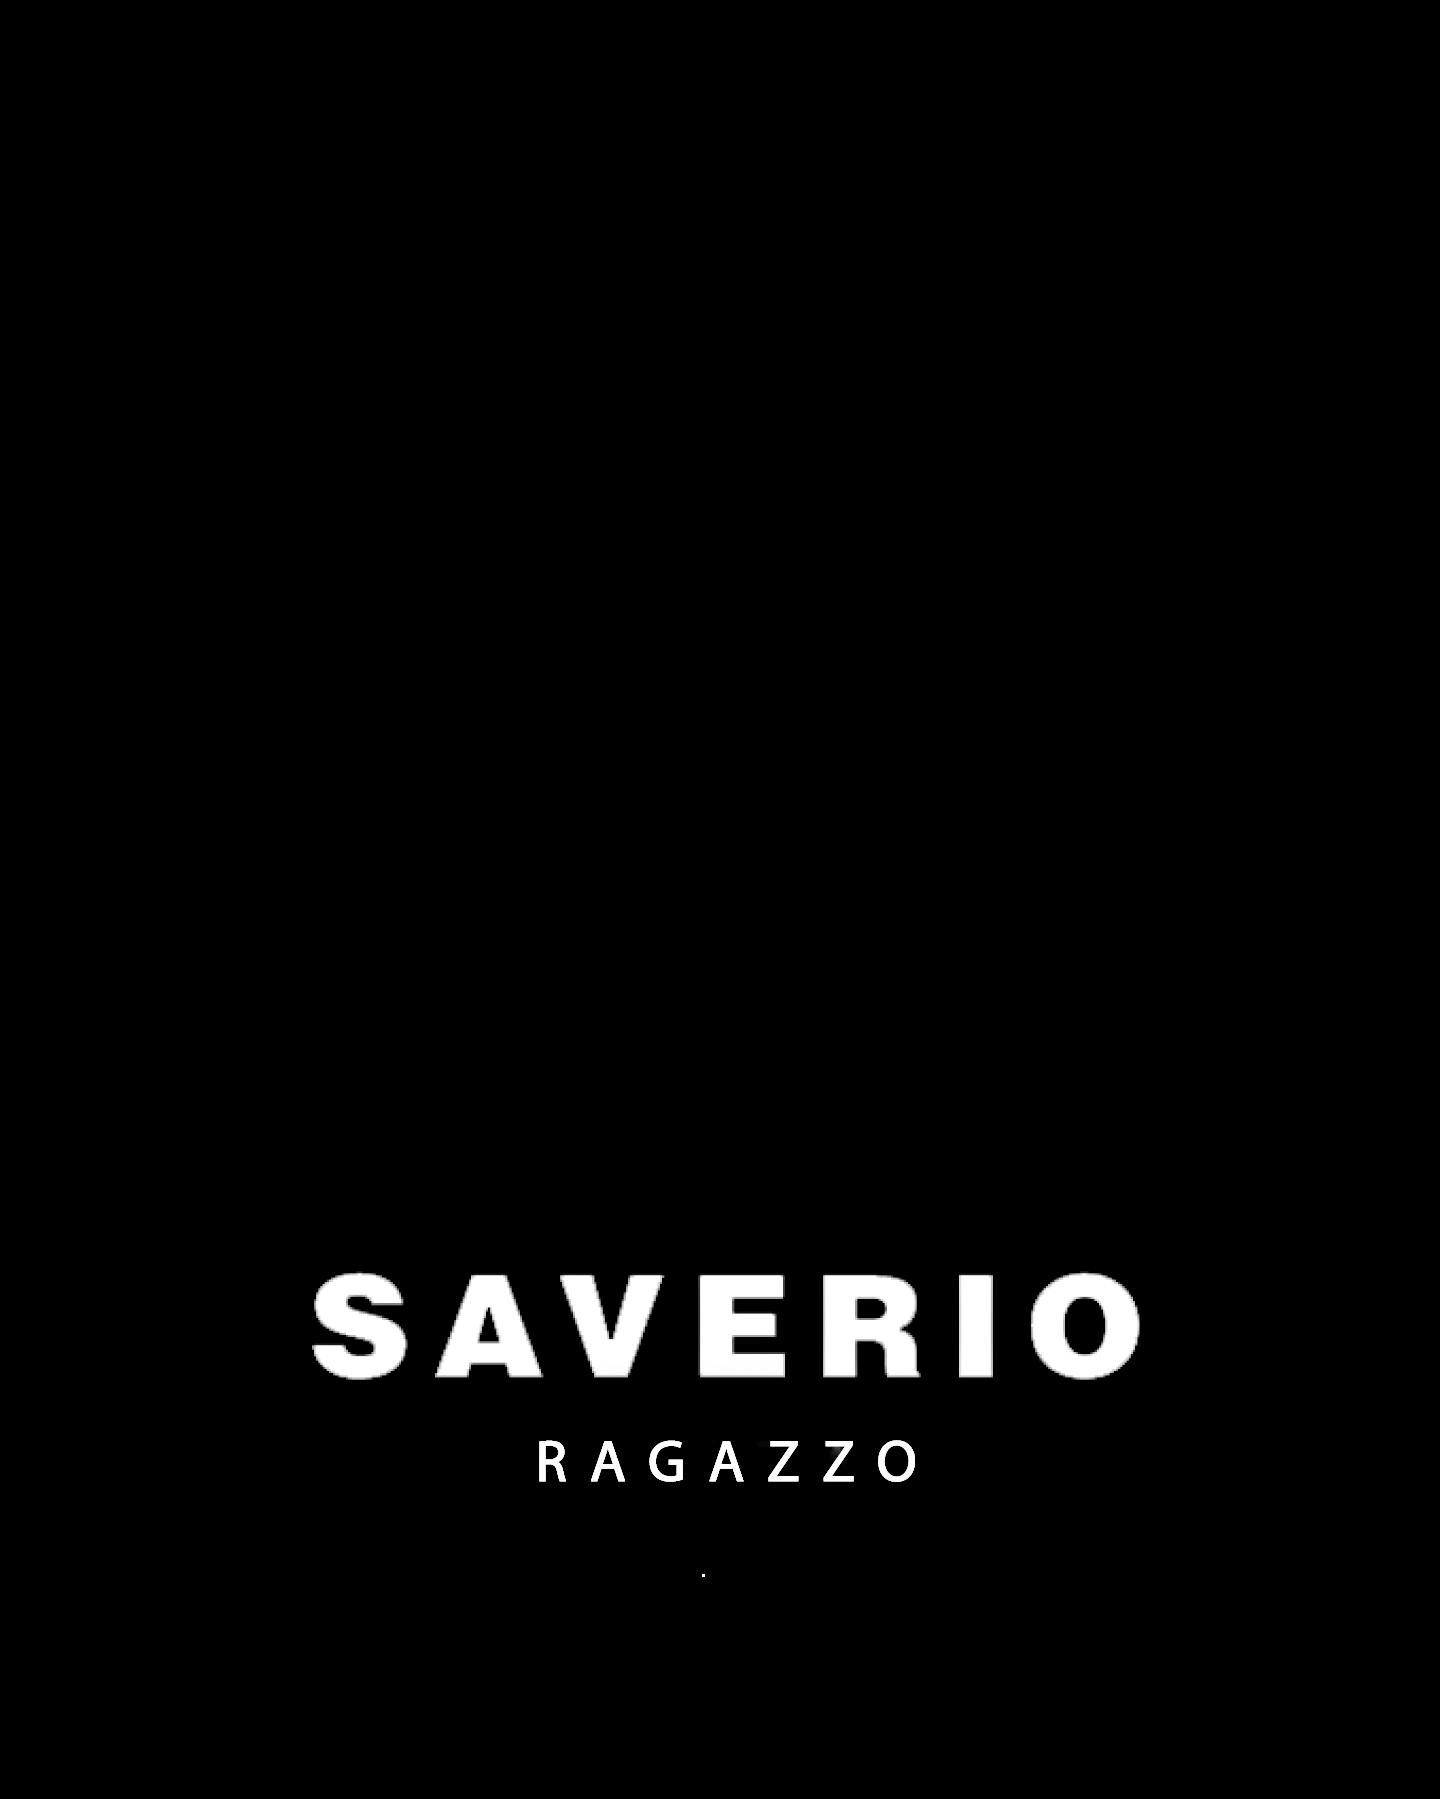 Saverio Moda Ragazzo